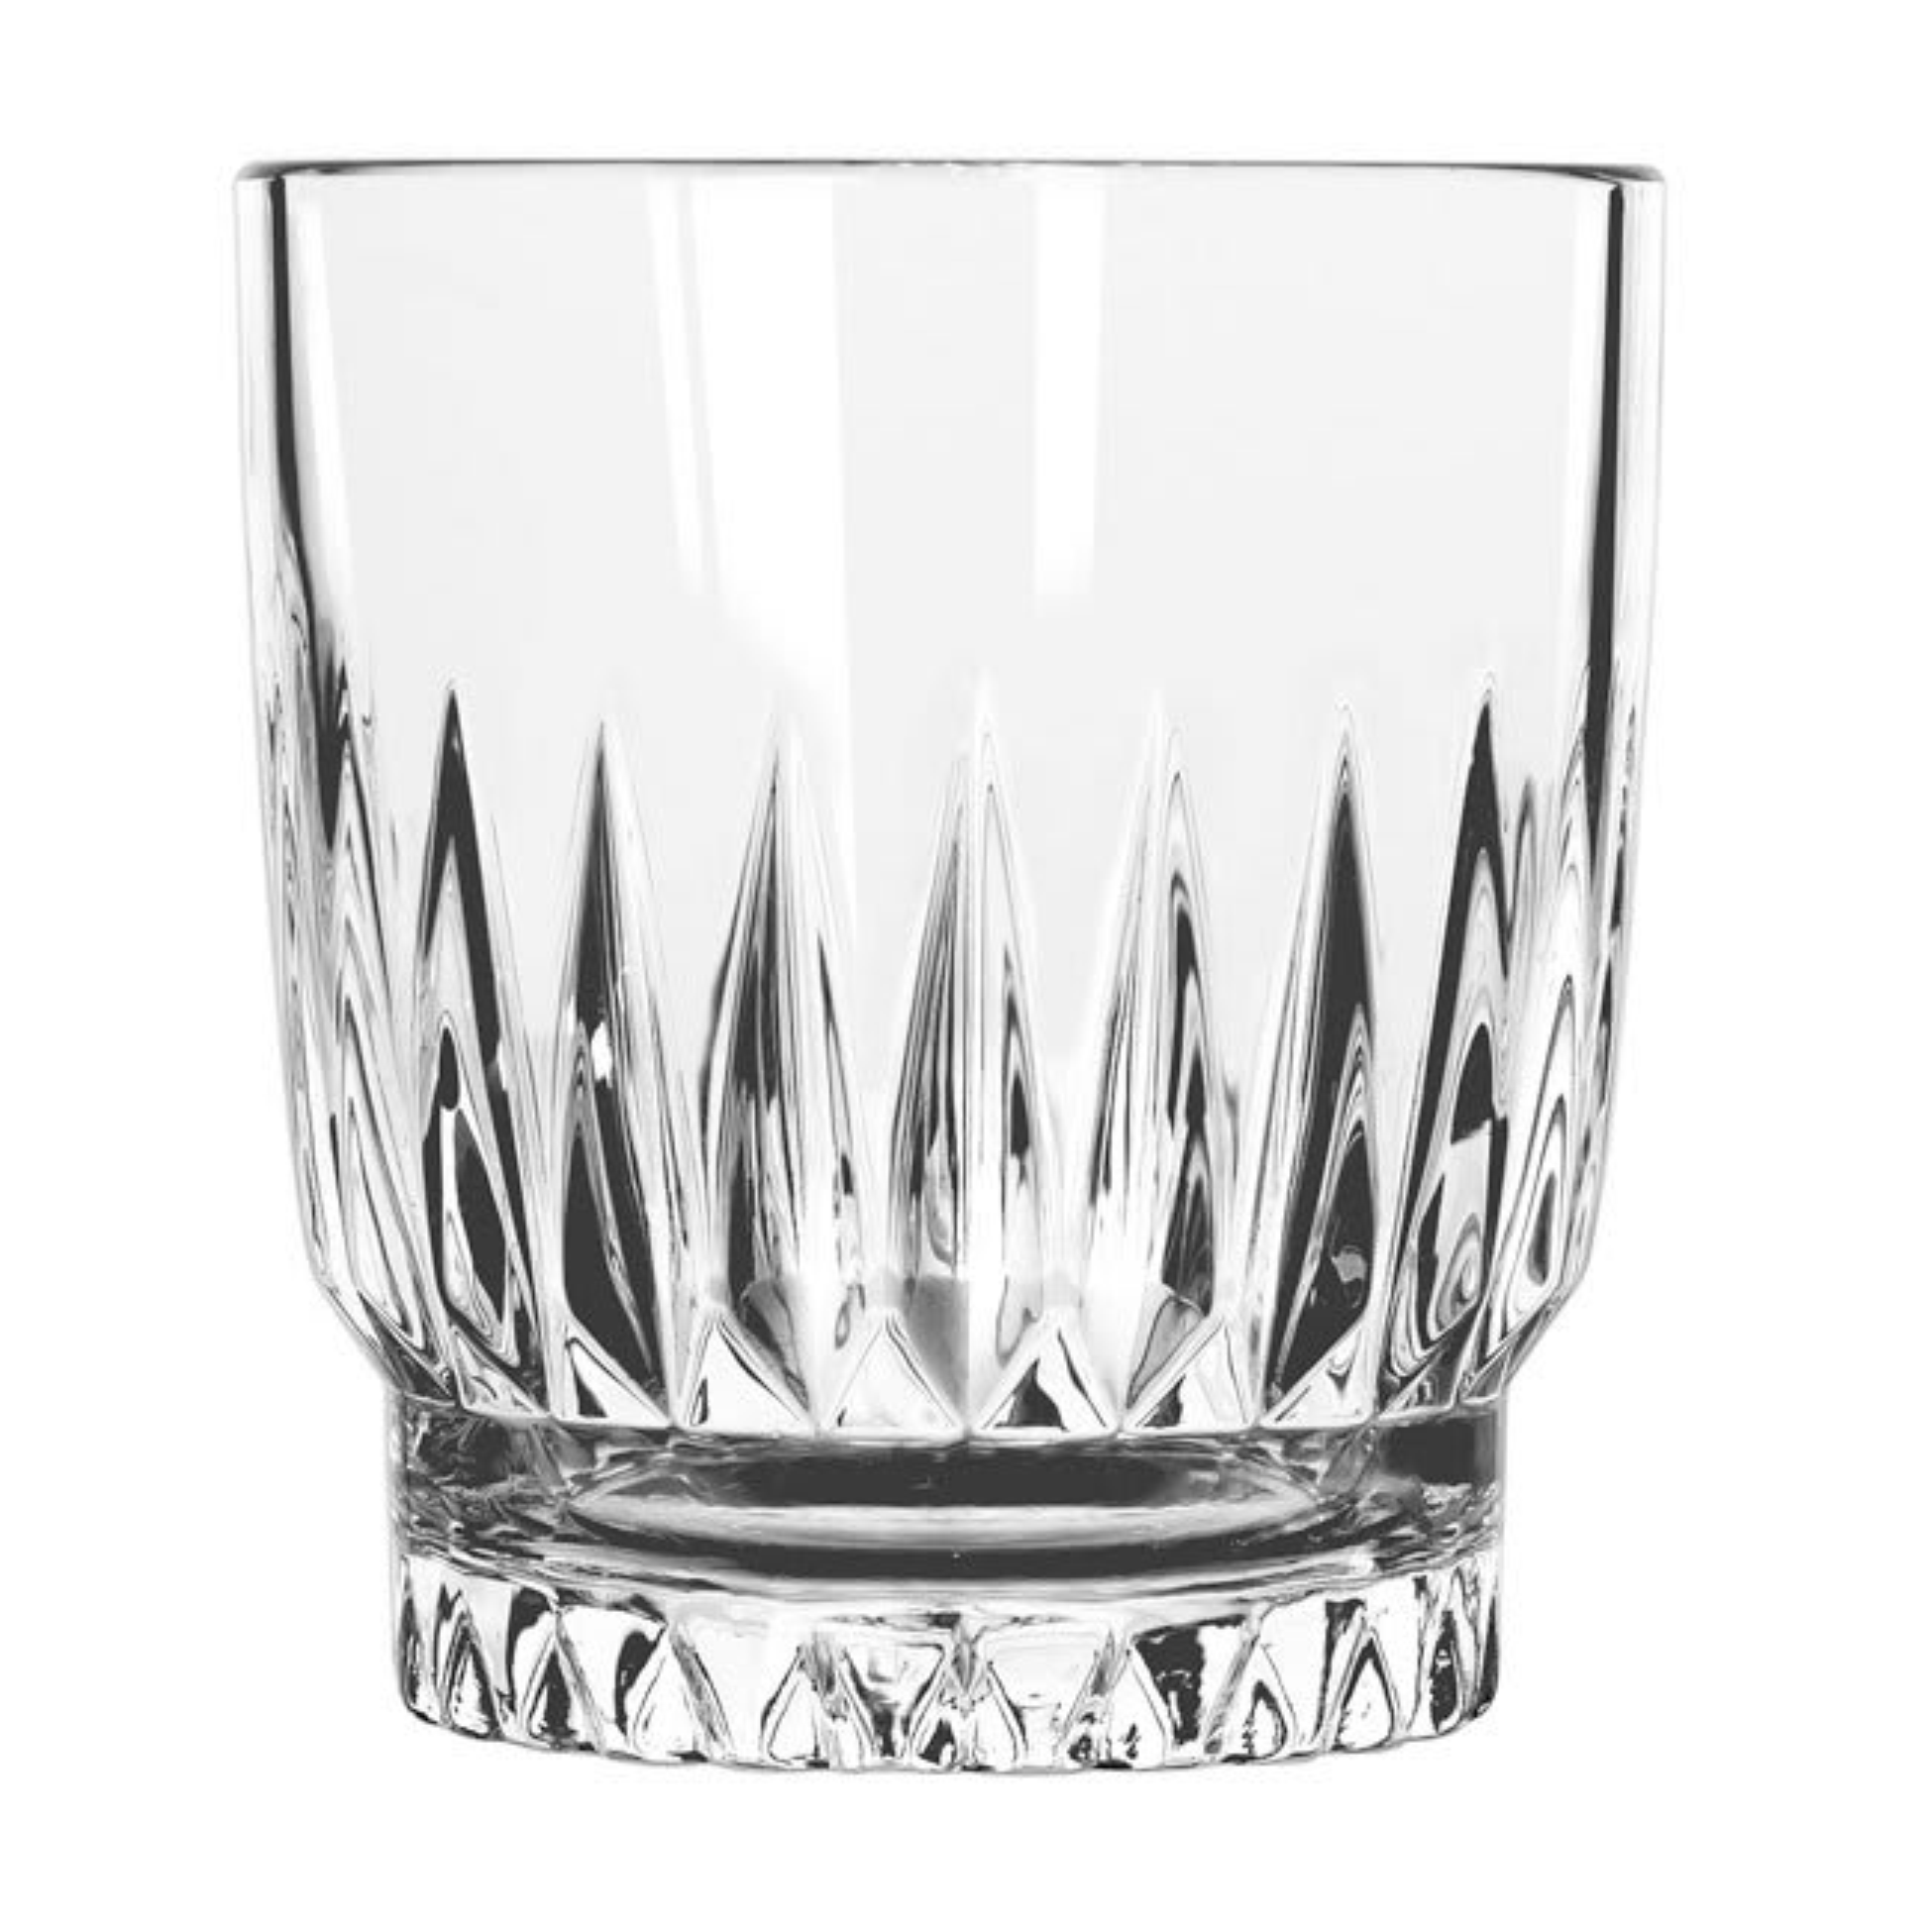 Libbey 15457 10-oz Rocks Glass - Winchester